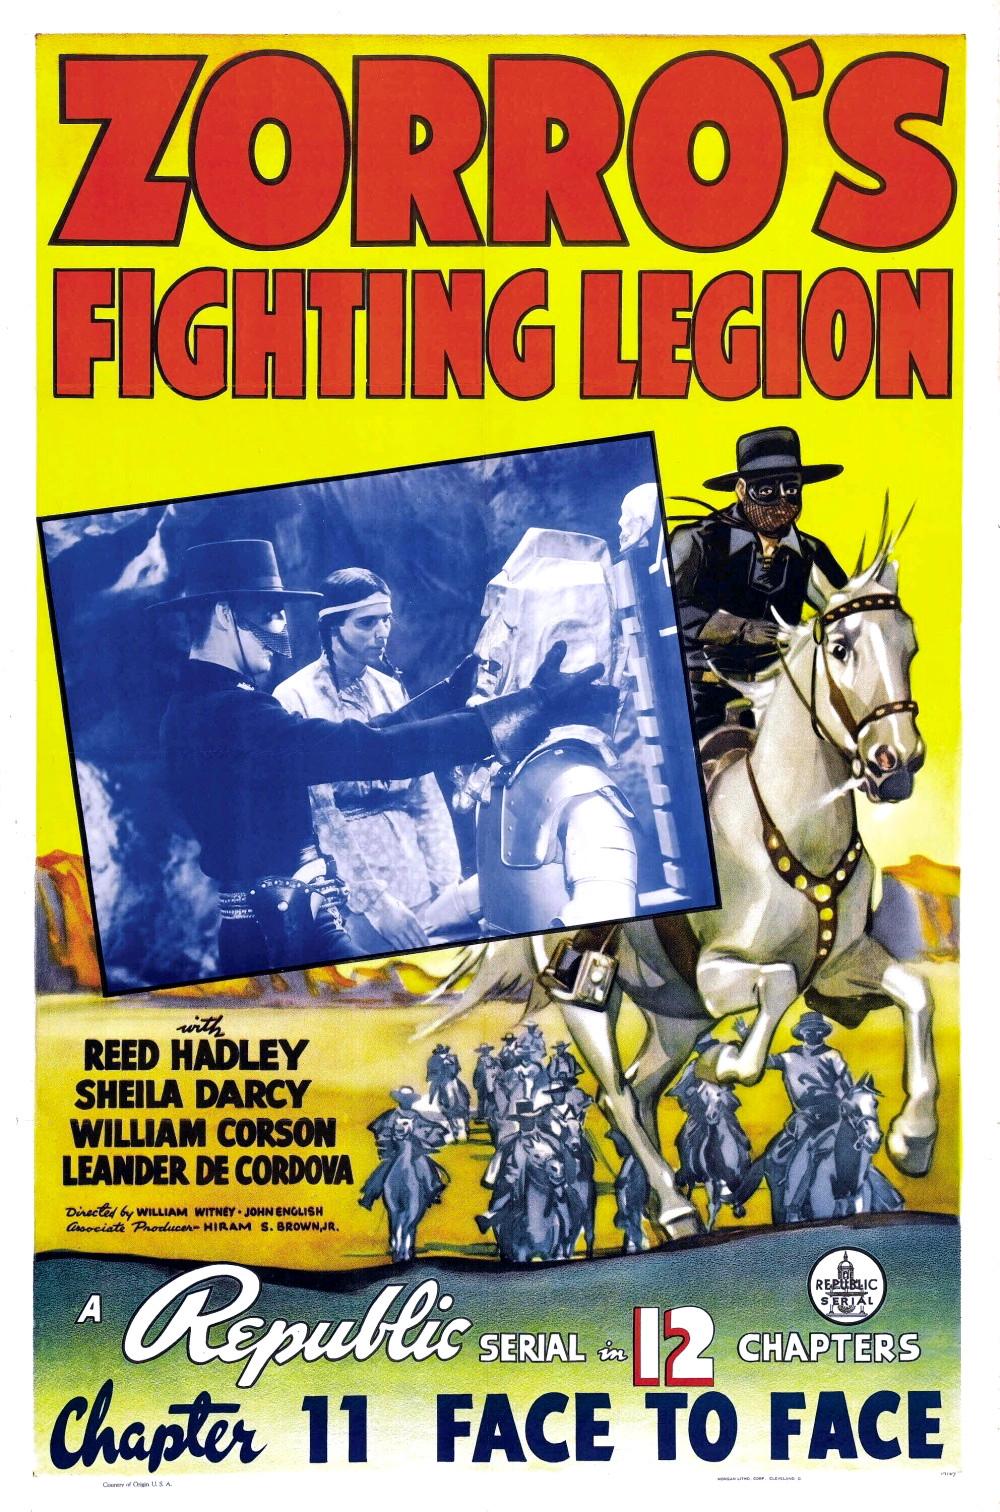 Zorros Fighting Legion  Wikipedia